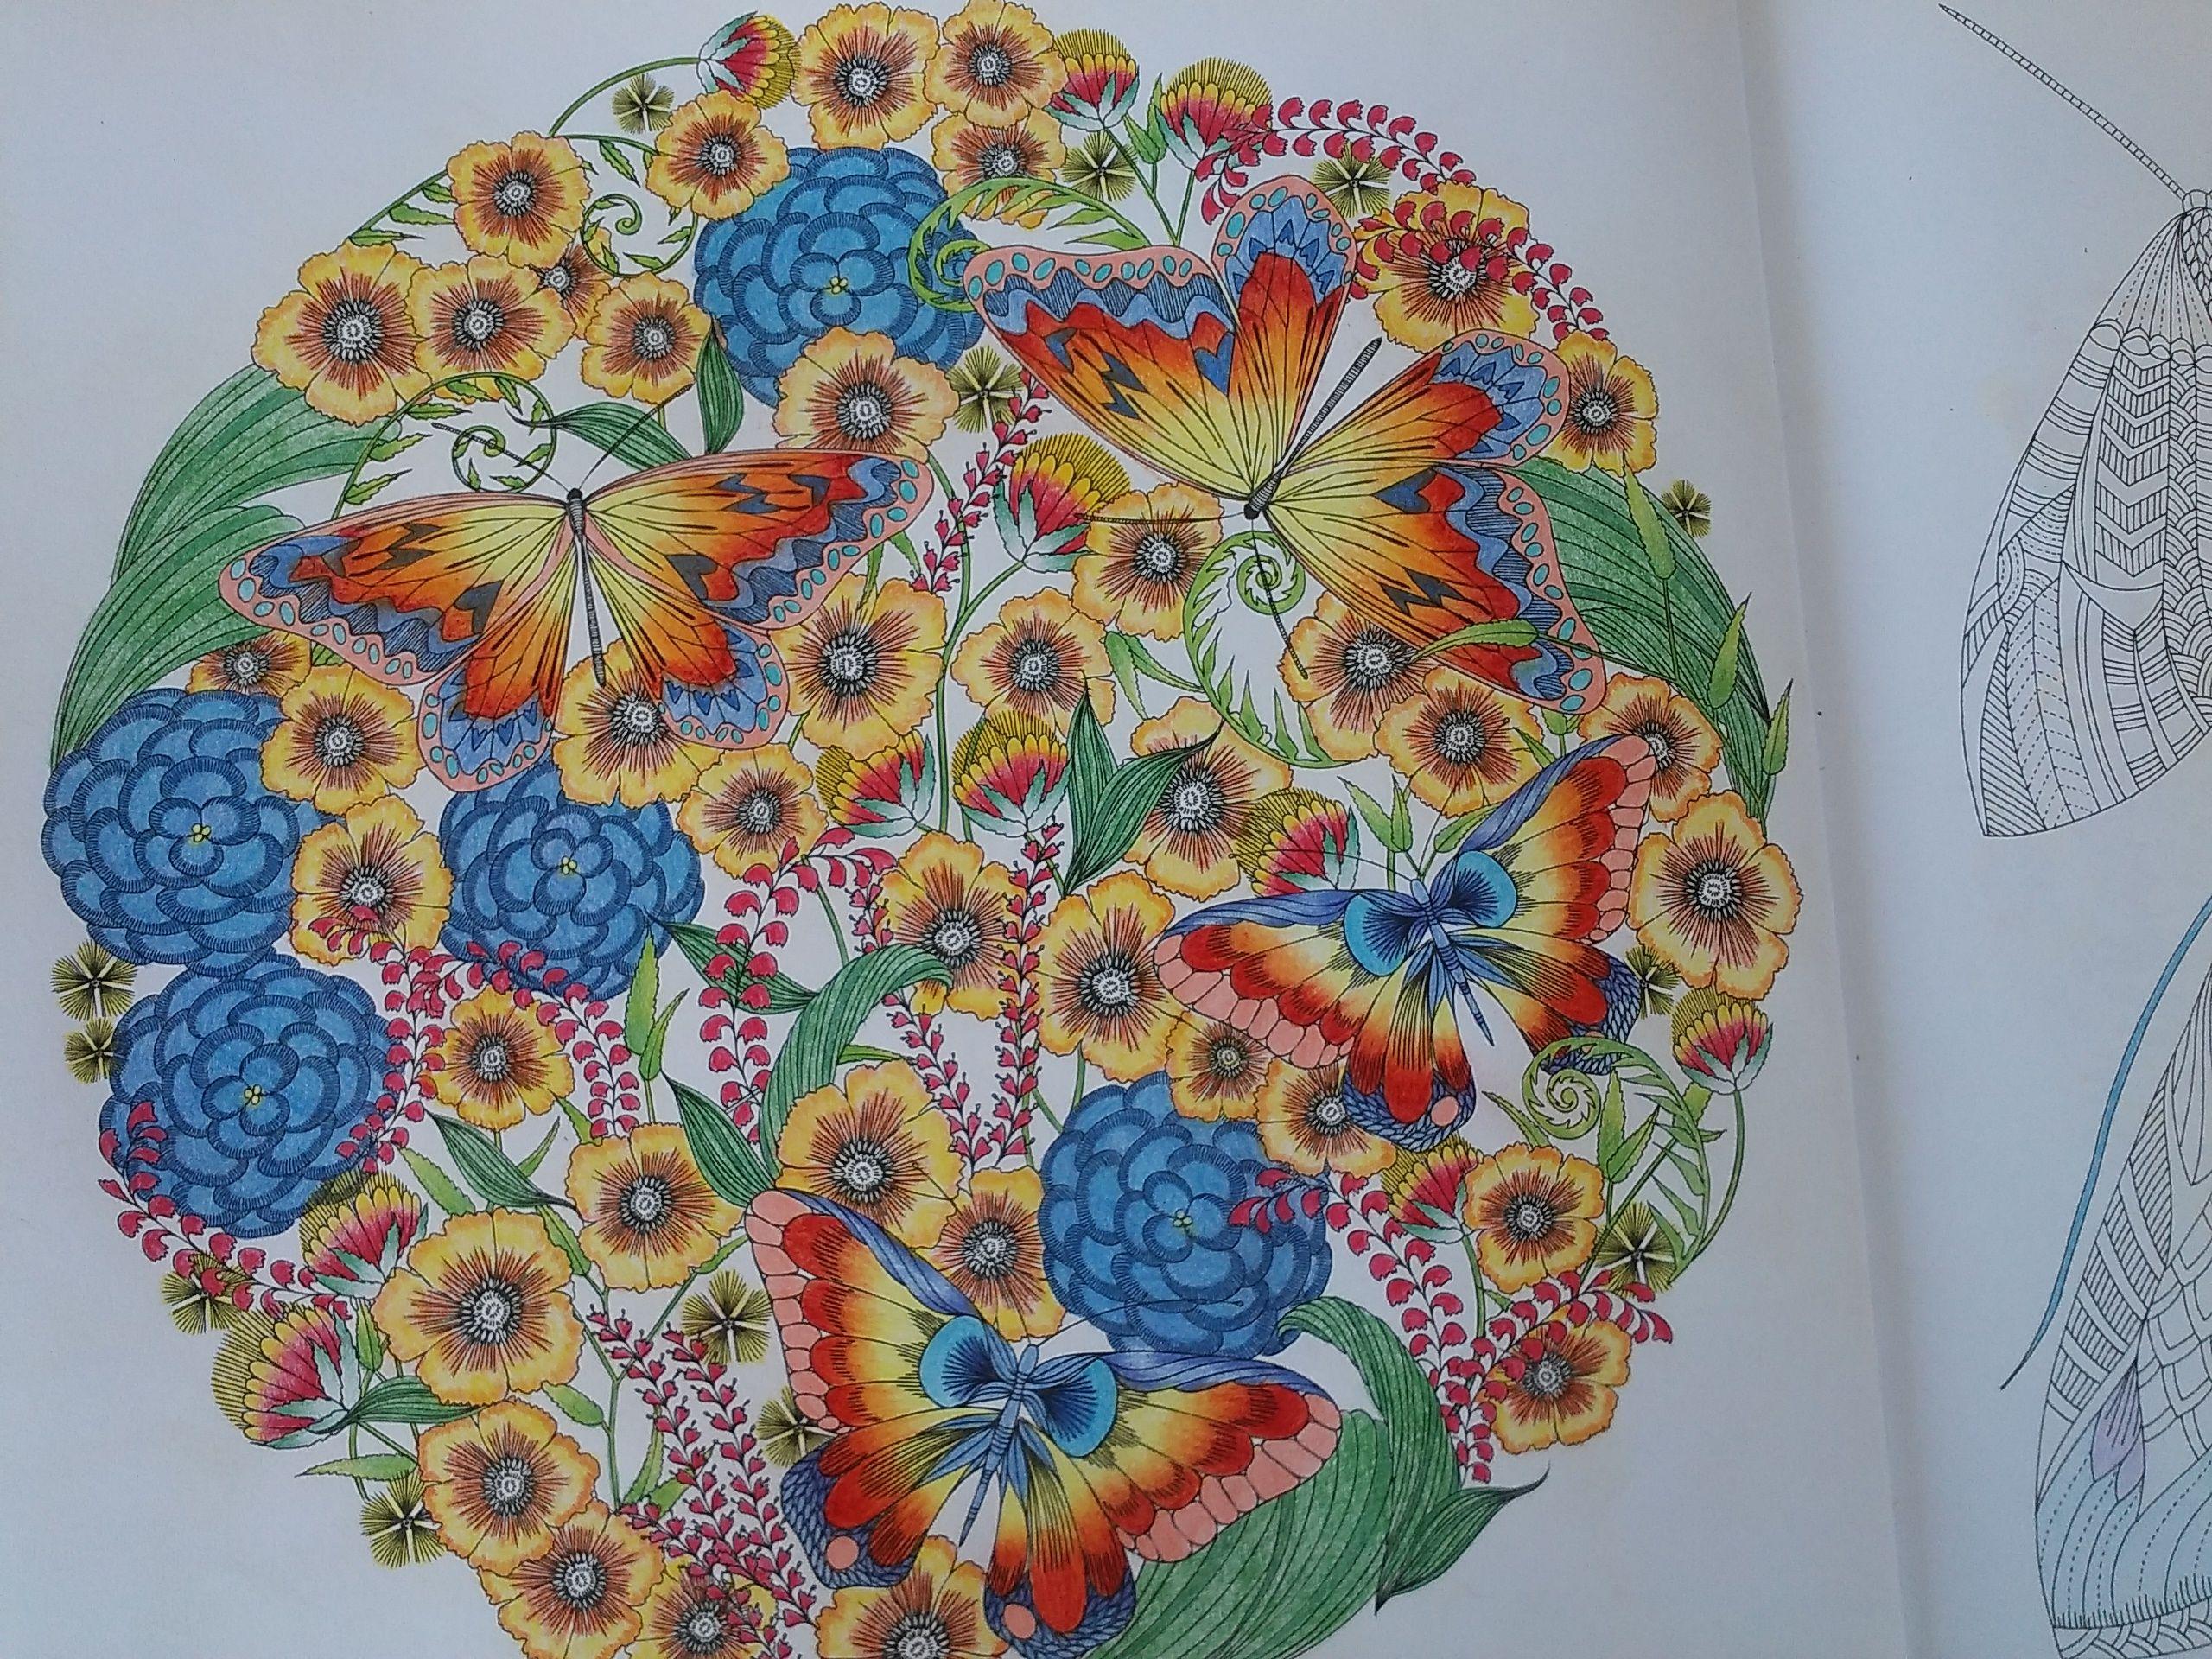 Animal kingdom coloring book gorilla - Coloring Books Millie Marotta Animal Kingdom By Mandarina